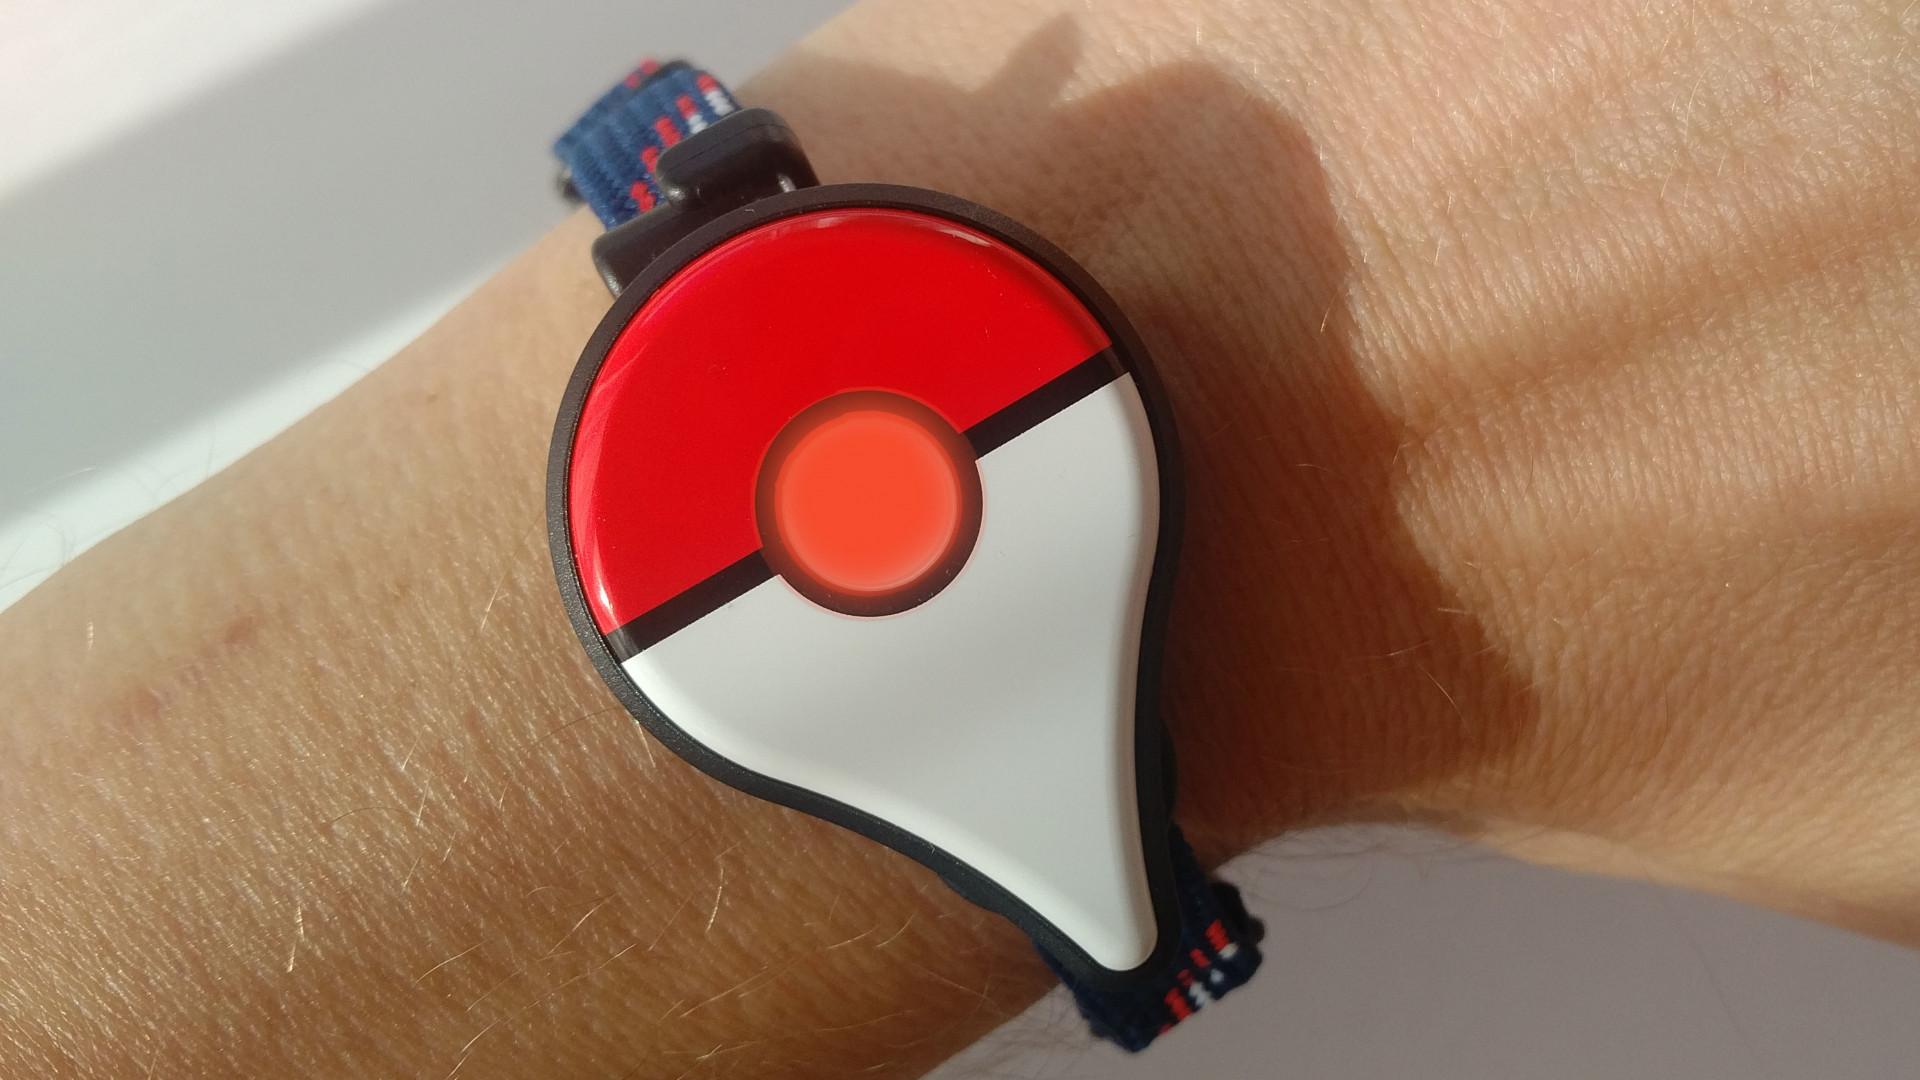 Pokémon-Go-Gadget: Das Pokémon Go Plus im Selbstversuch